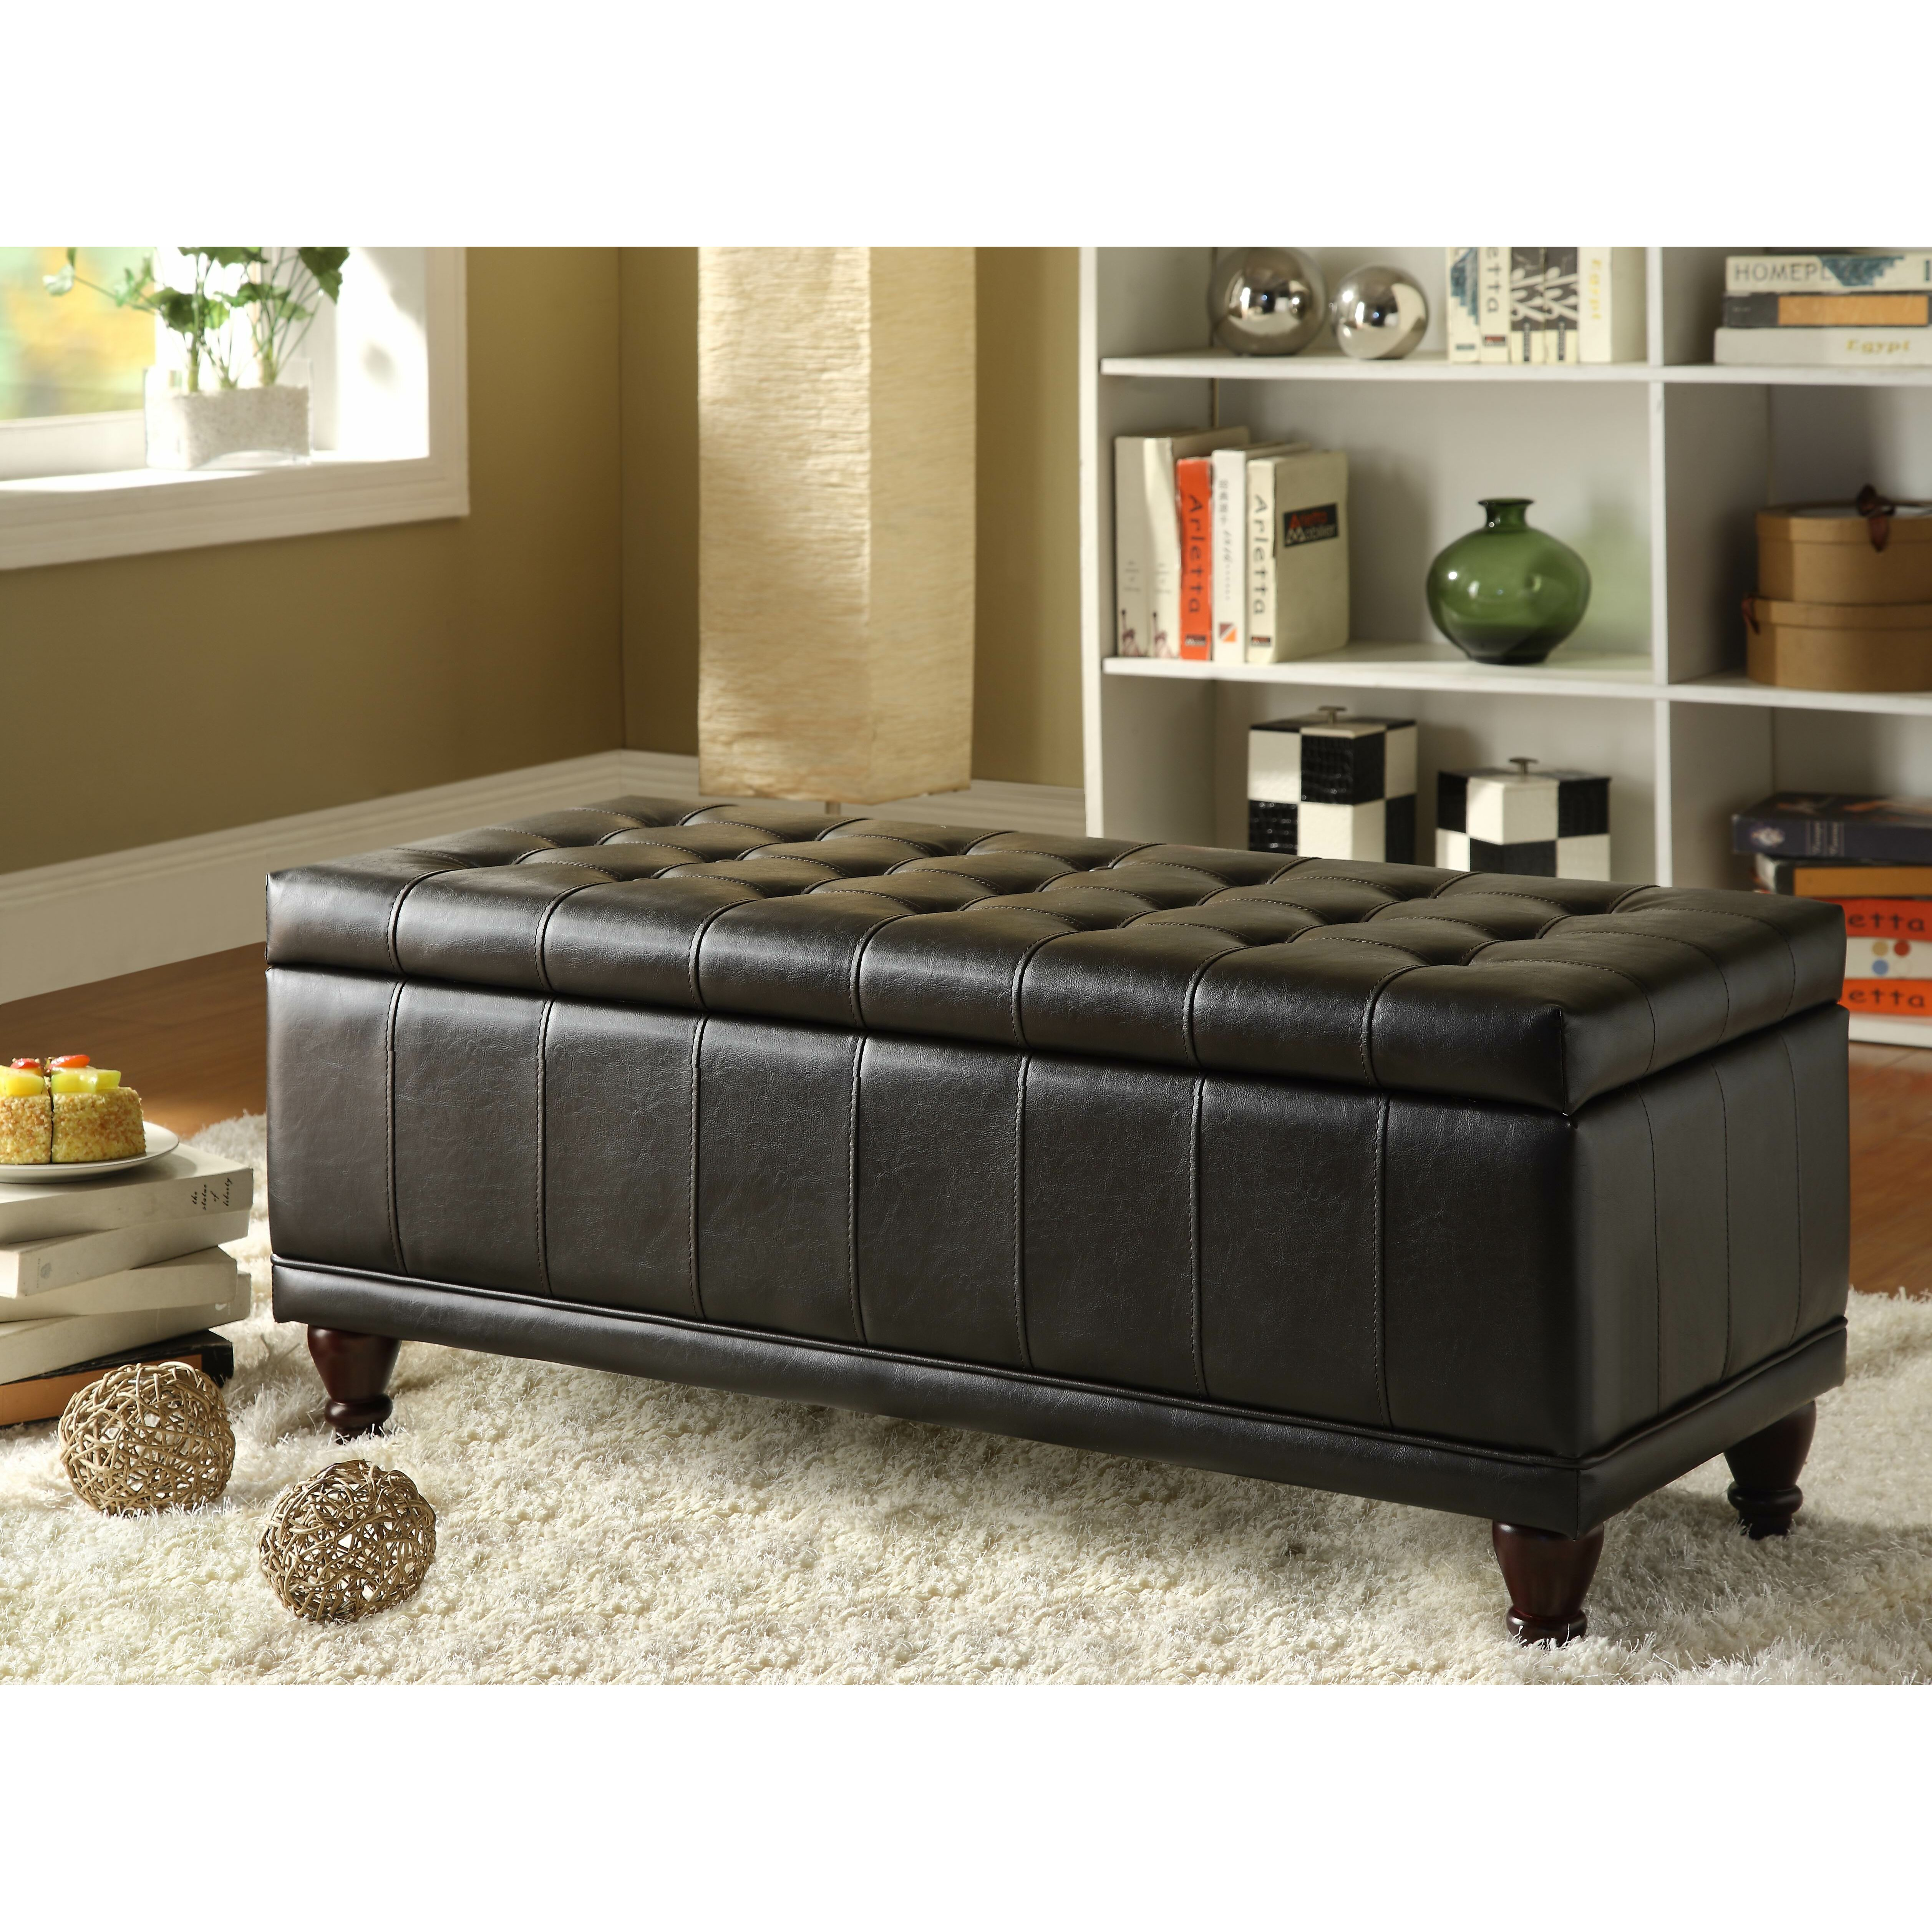 hill adelia bi cast vinyl bedroom storage ottoman reviews wayfair